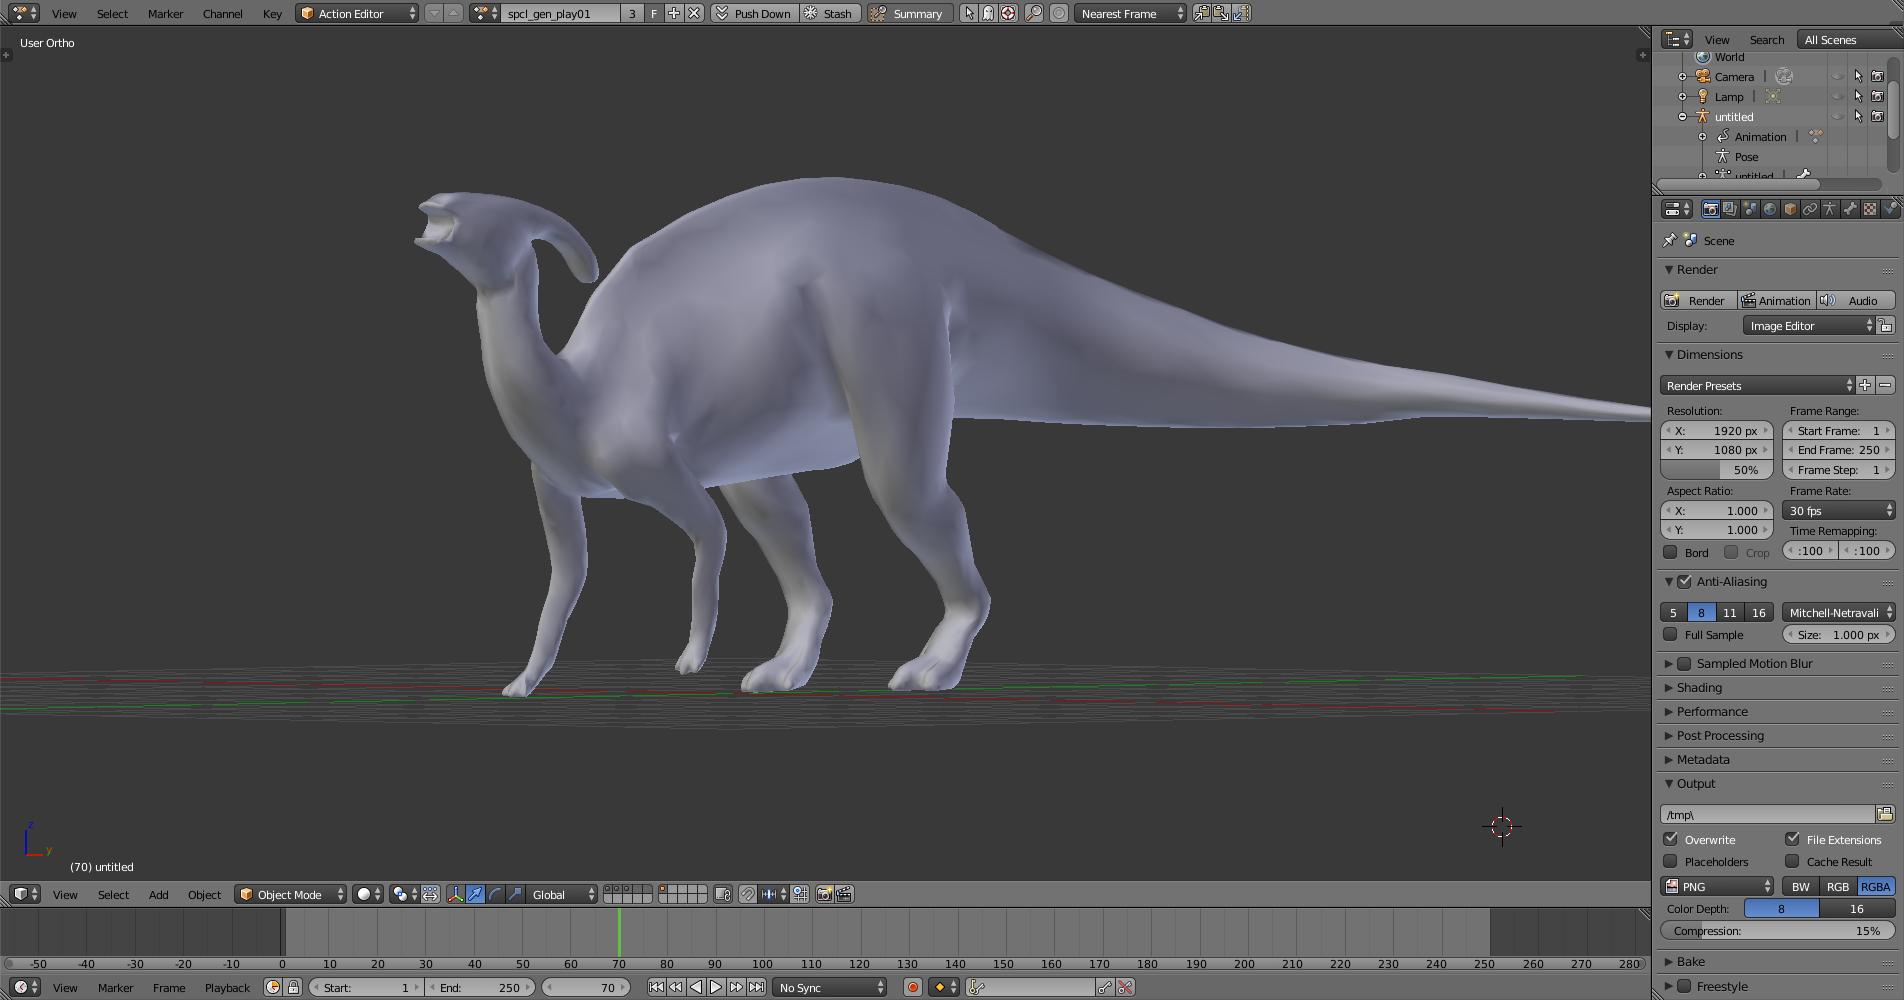 Model of the Jurassic Park Parasaurolophus